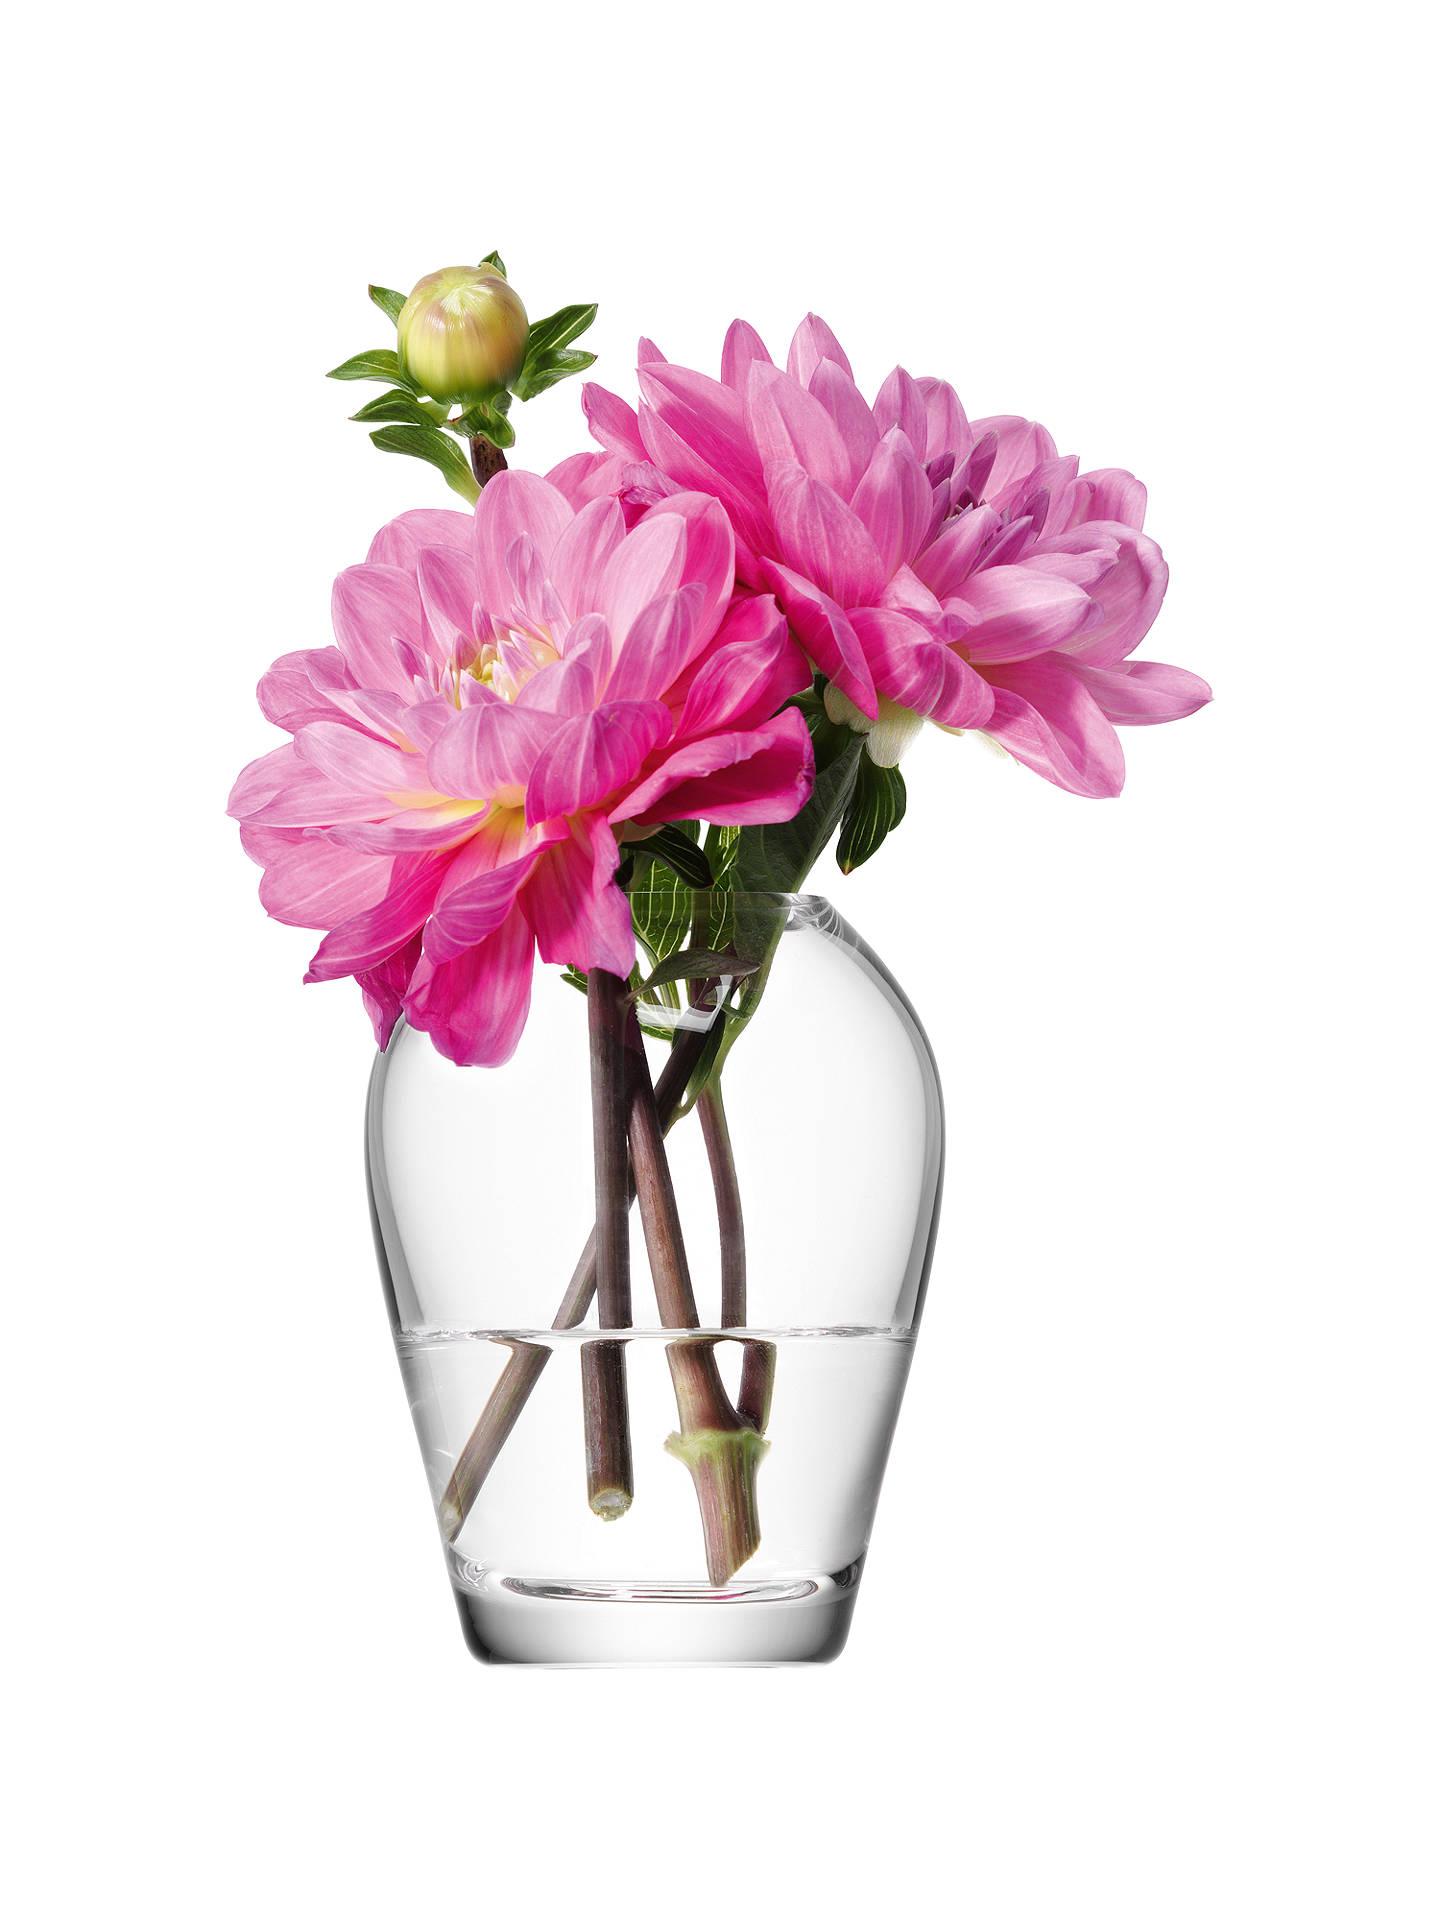 Lsa flower mini bouquet vase clear at john lewis partners buylsa flower mini bouquet vase clear online at johnlewis izmirmasajfo